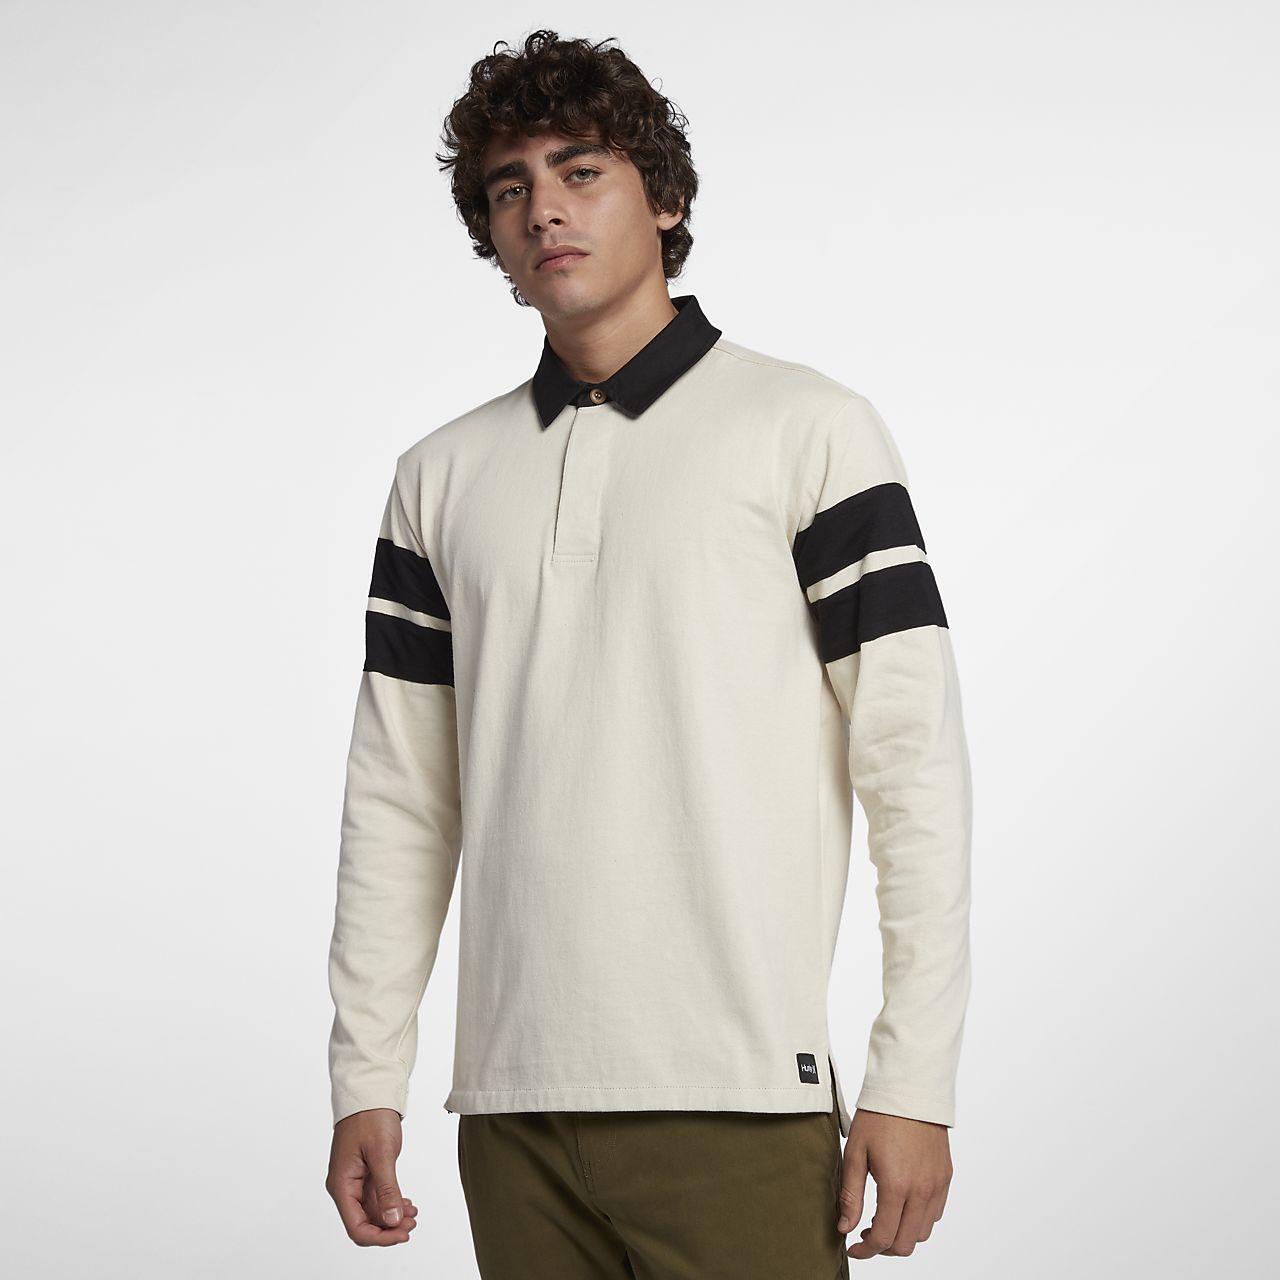 ea26d0a6591d Ανδρική μακρυμάνικη μπλούζα πόλο Hurley Rugby. Nike.com GR